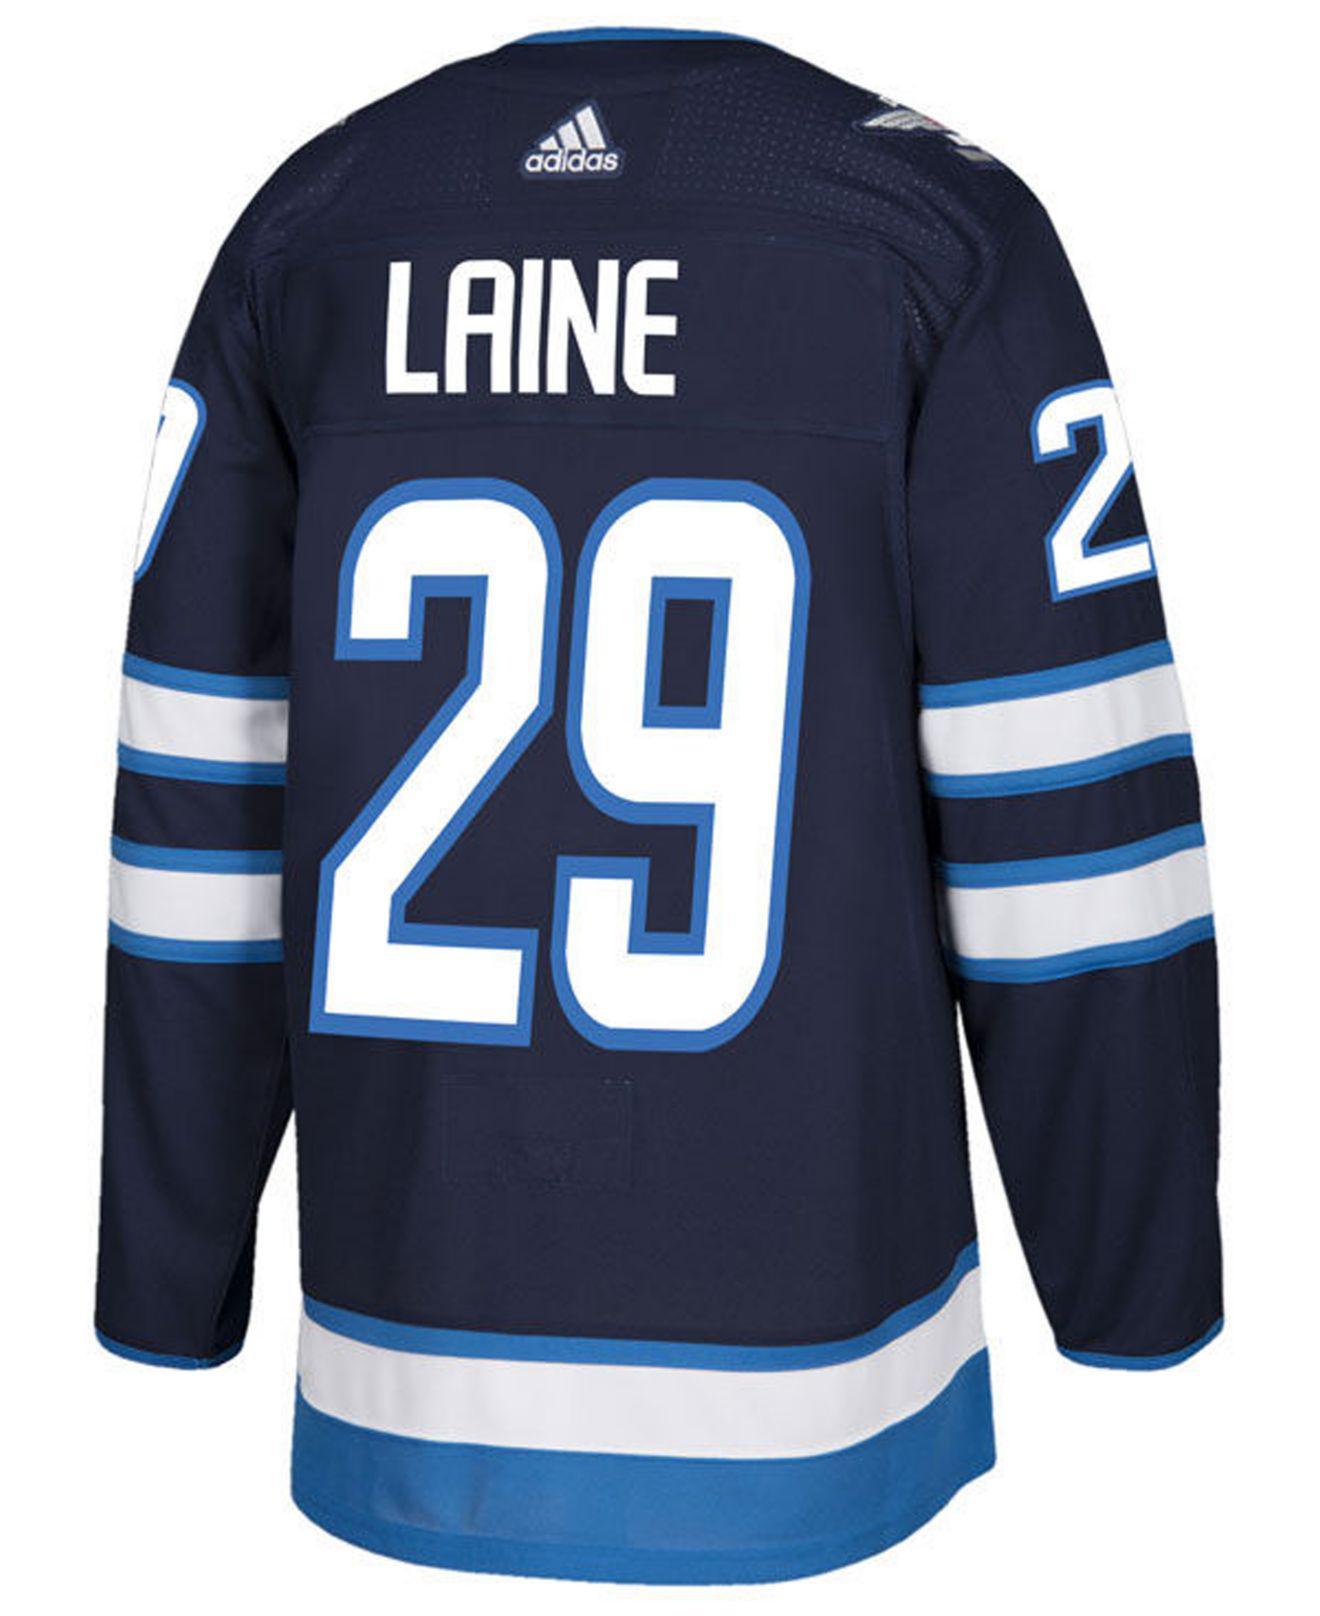 150355bb0160 Lyst - adidas Patrik Laine Winnipeg Jets Adizero Authentic Pro ...